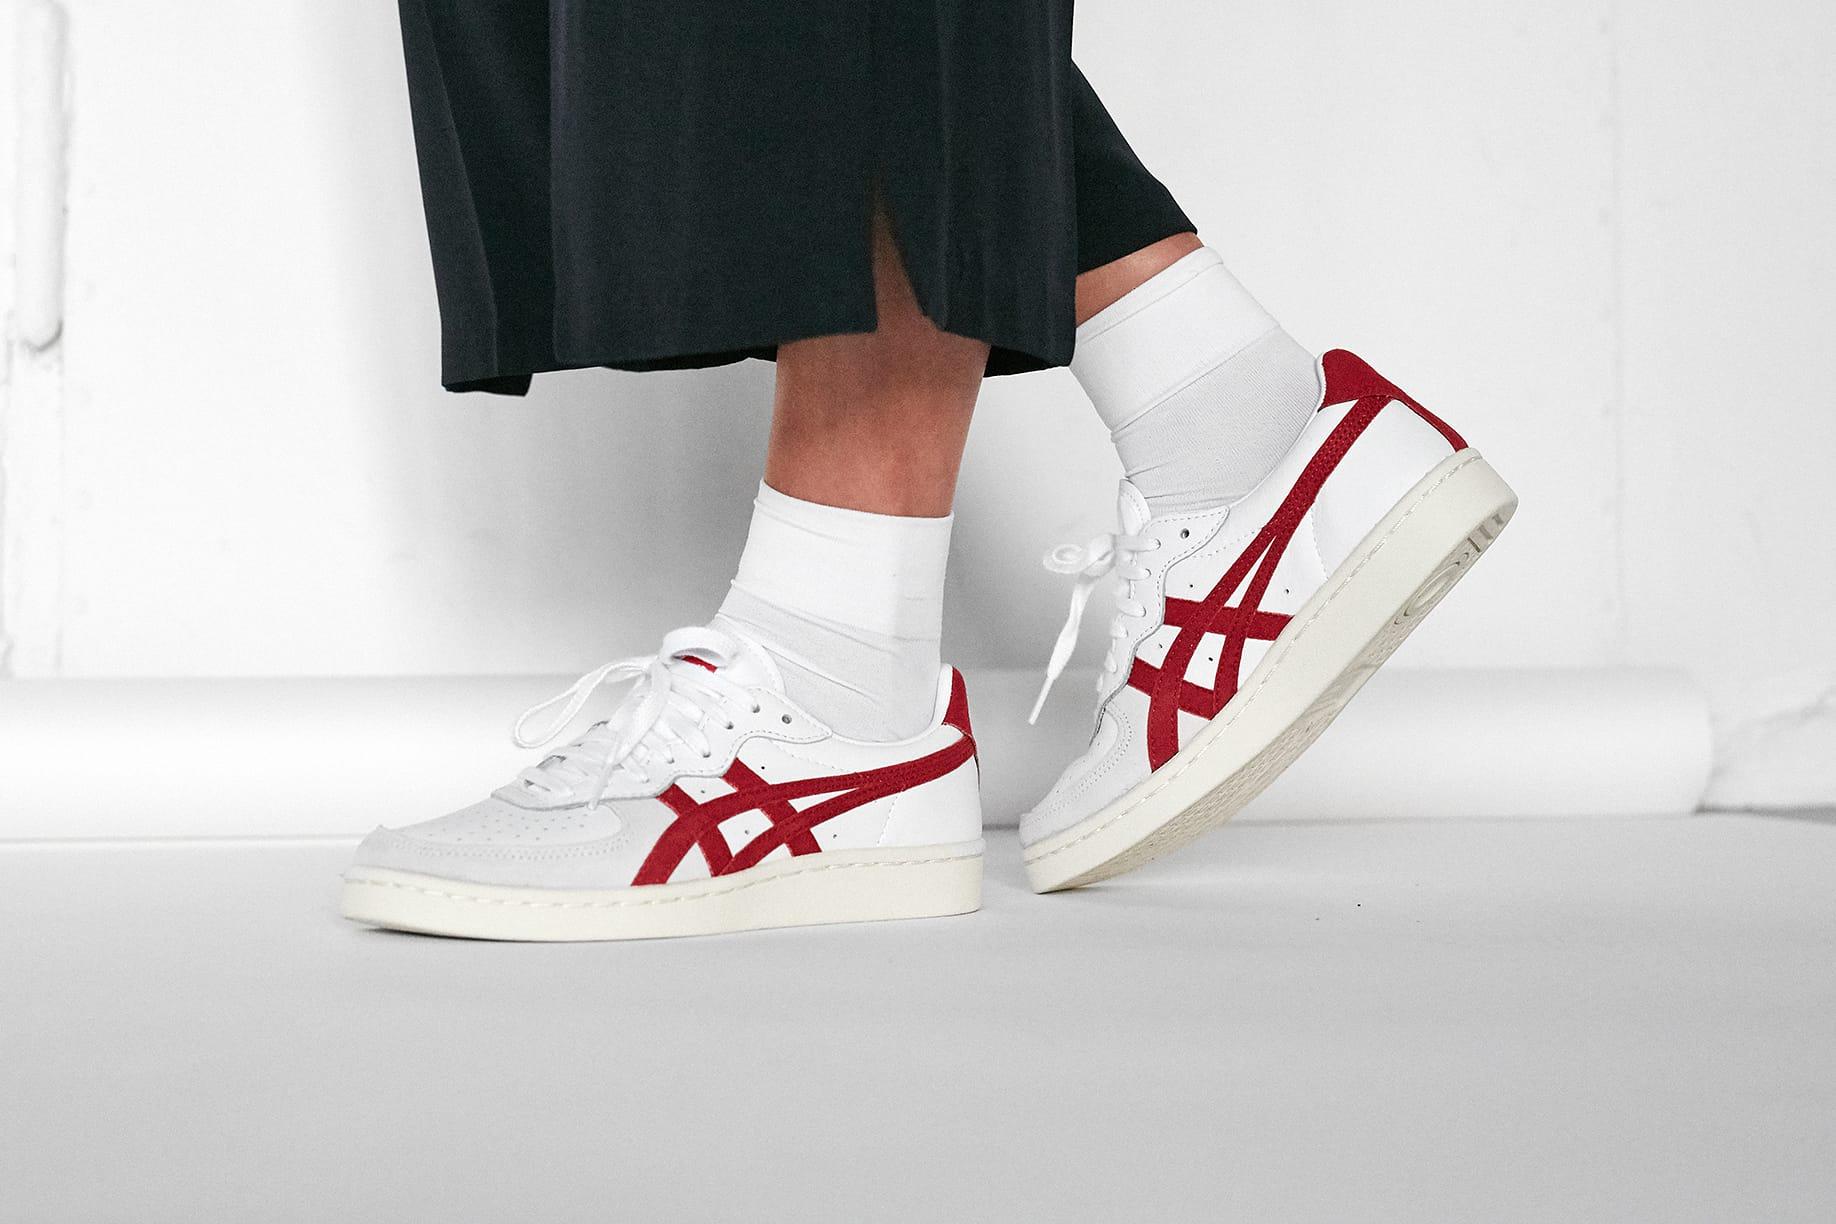 asics gsm on feet